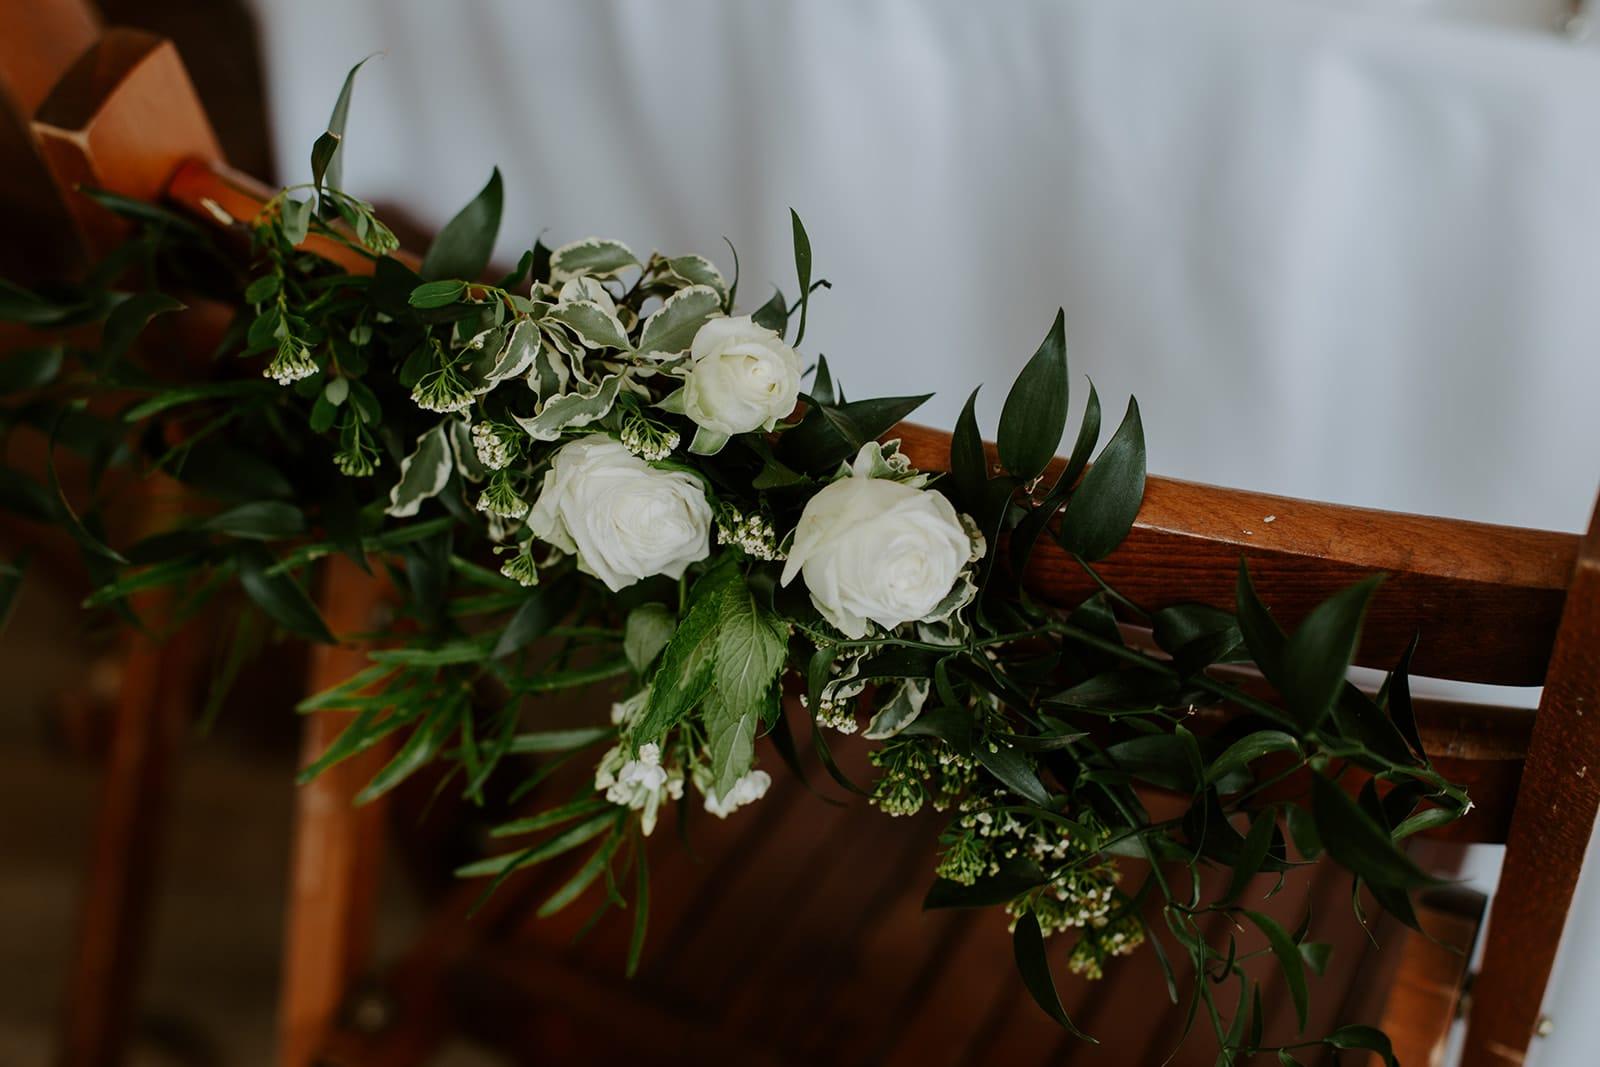 mariage_chateau_la_flocelliere_vendee_flavie_nelly_photographe-58-obonheurdesdames-decoration-mariage-location-vegetal